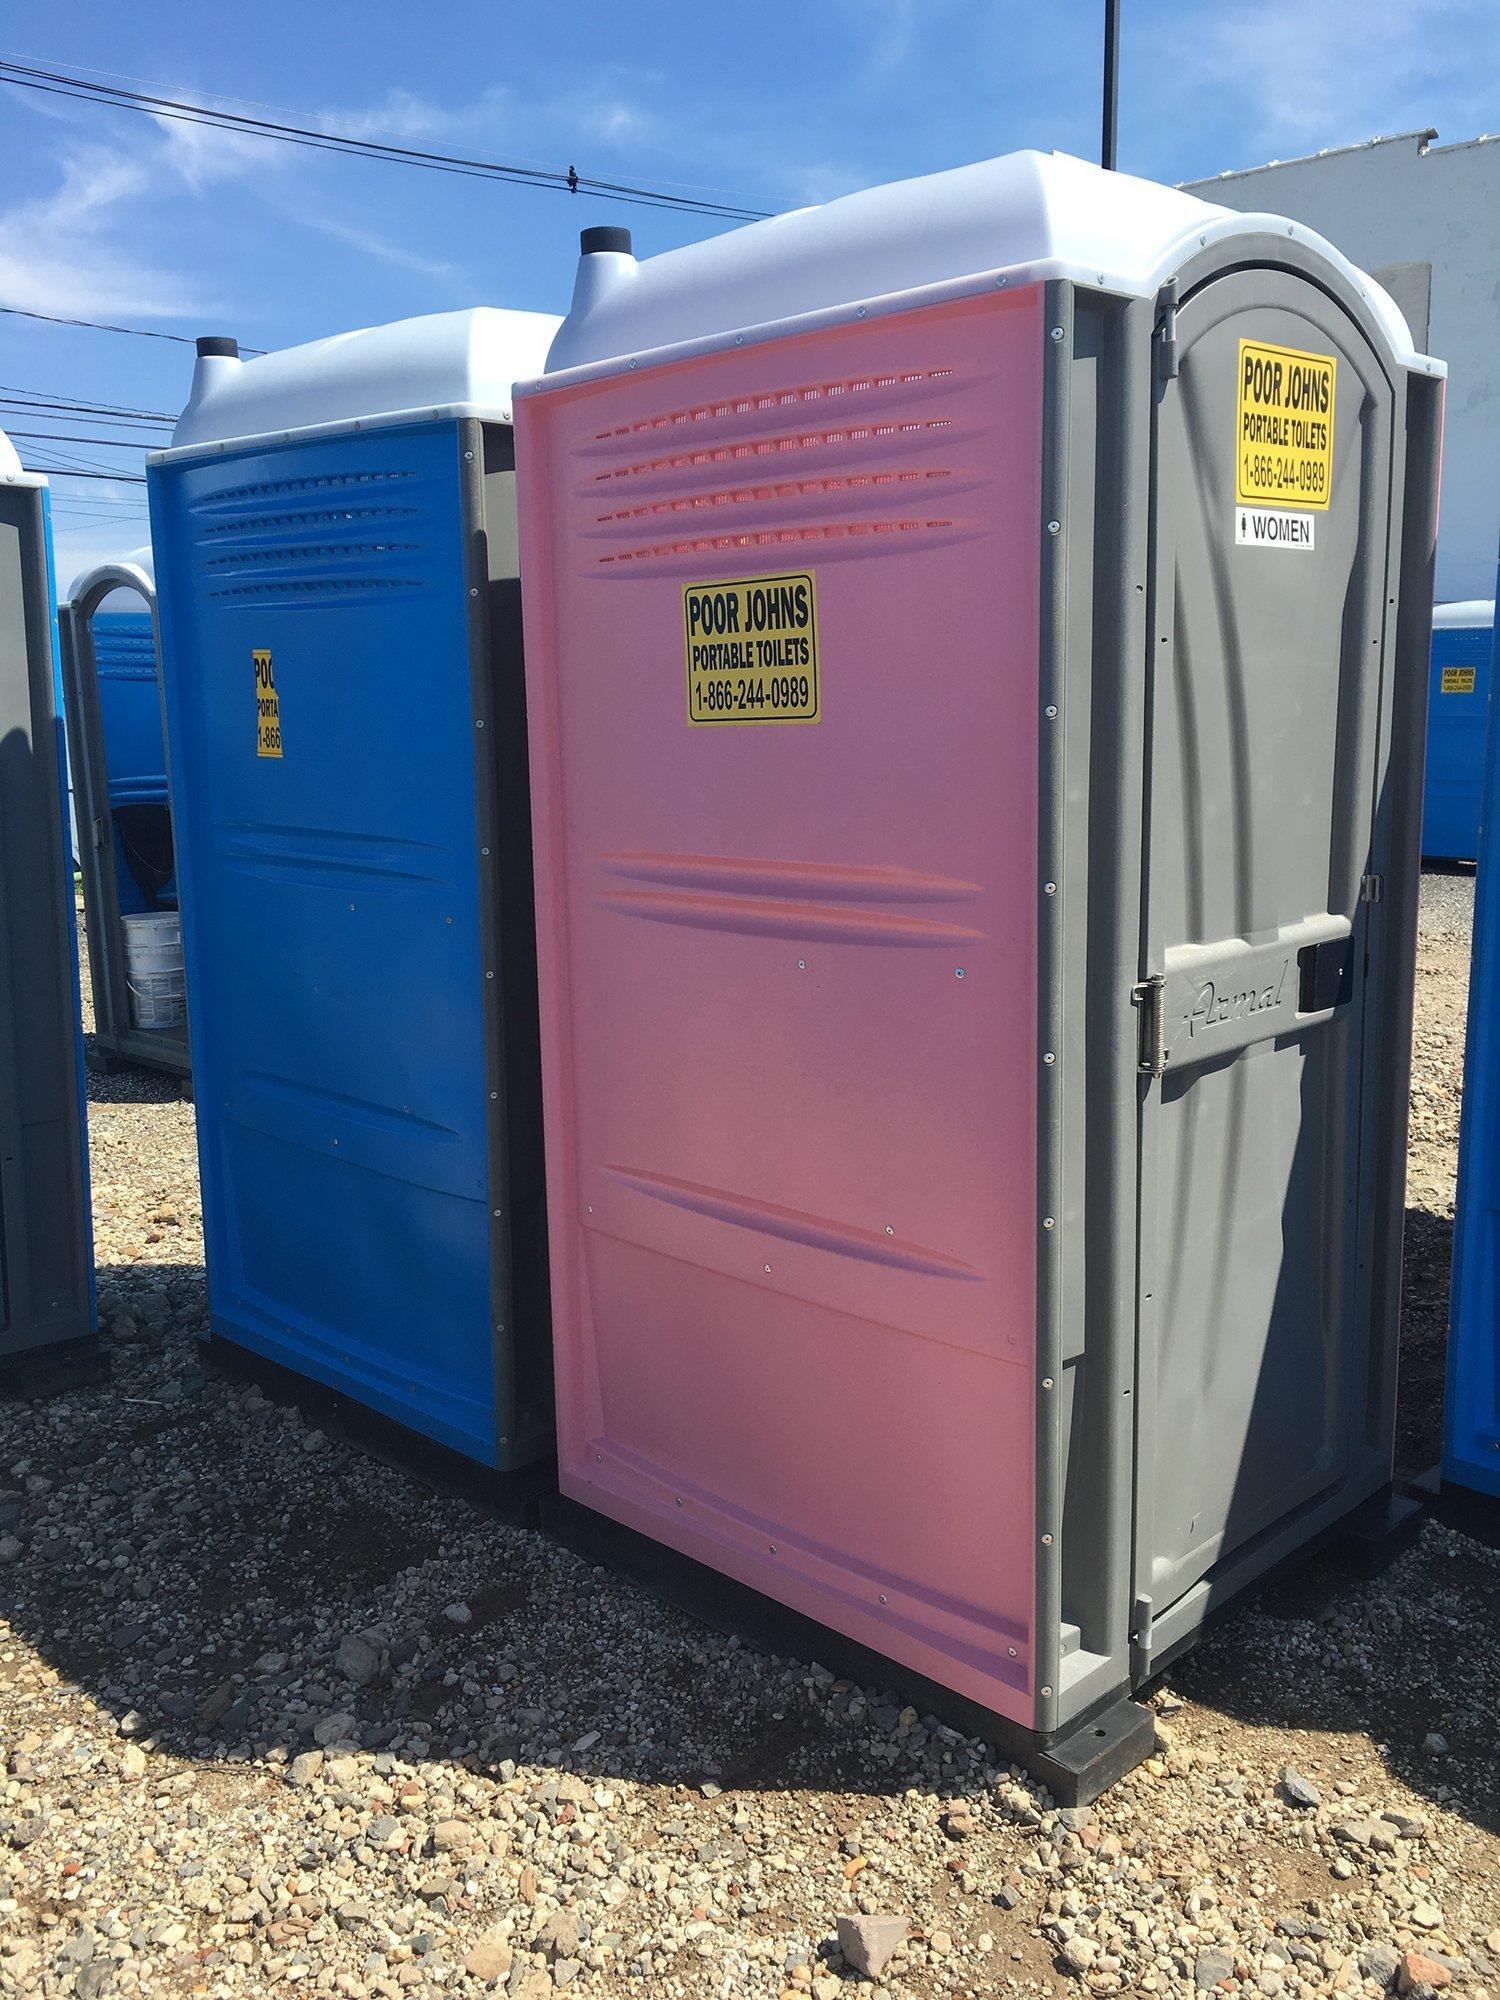 Poor John's Portable Toilets image 1